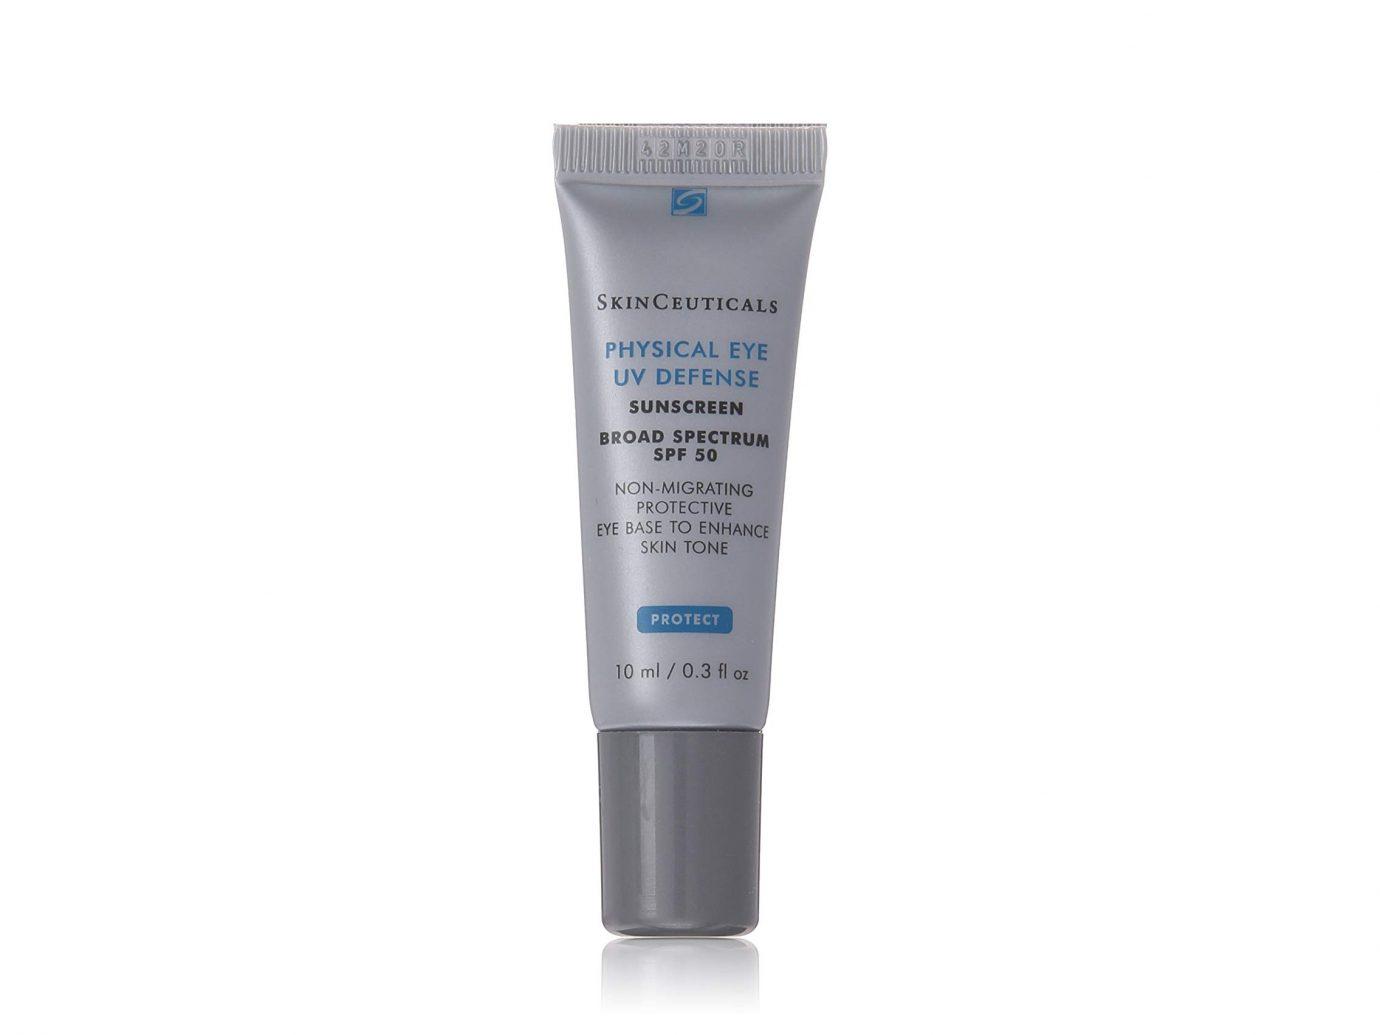 Skinceuticals Physical Eye UV Defense SPF 50